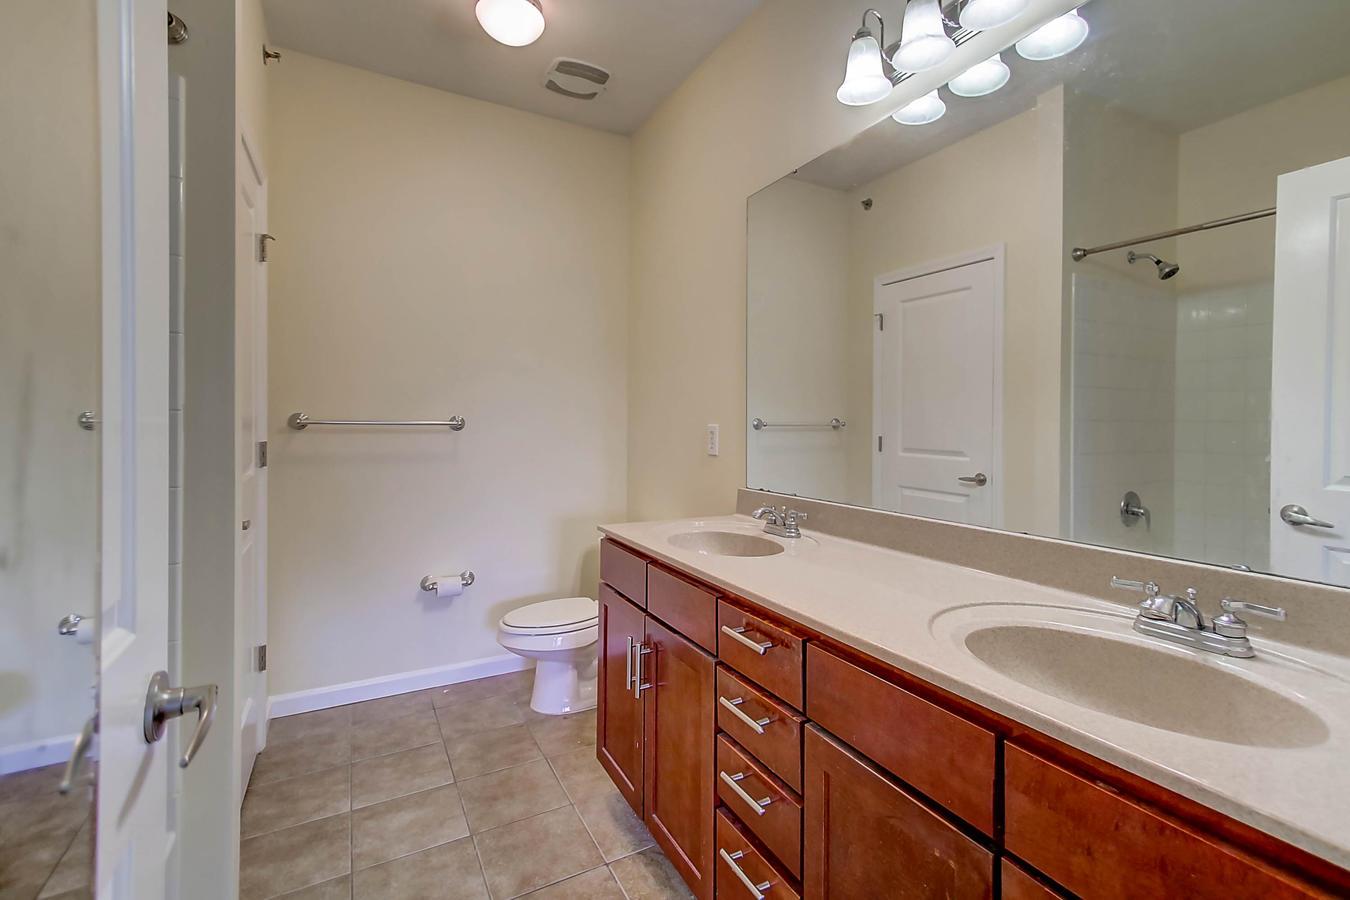 Regatta On James Island Homes For Sale - 1755 Central Park, Charleston, SC - 11